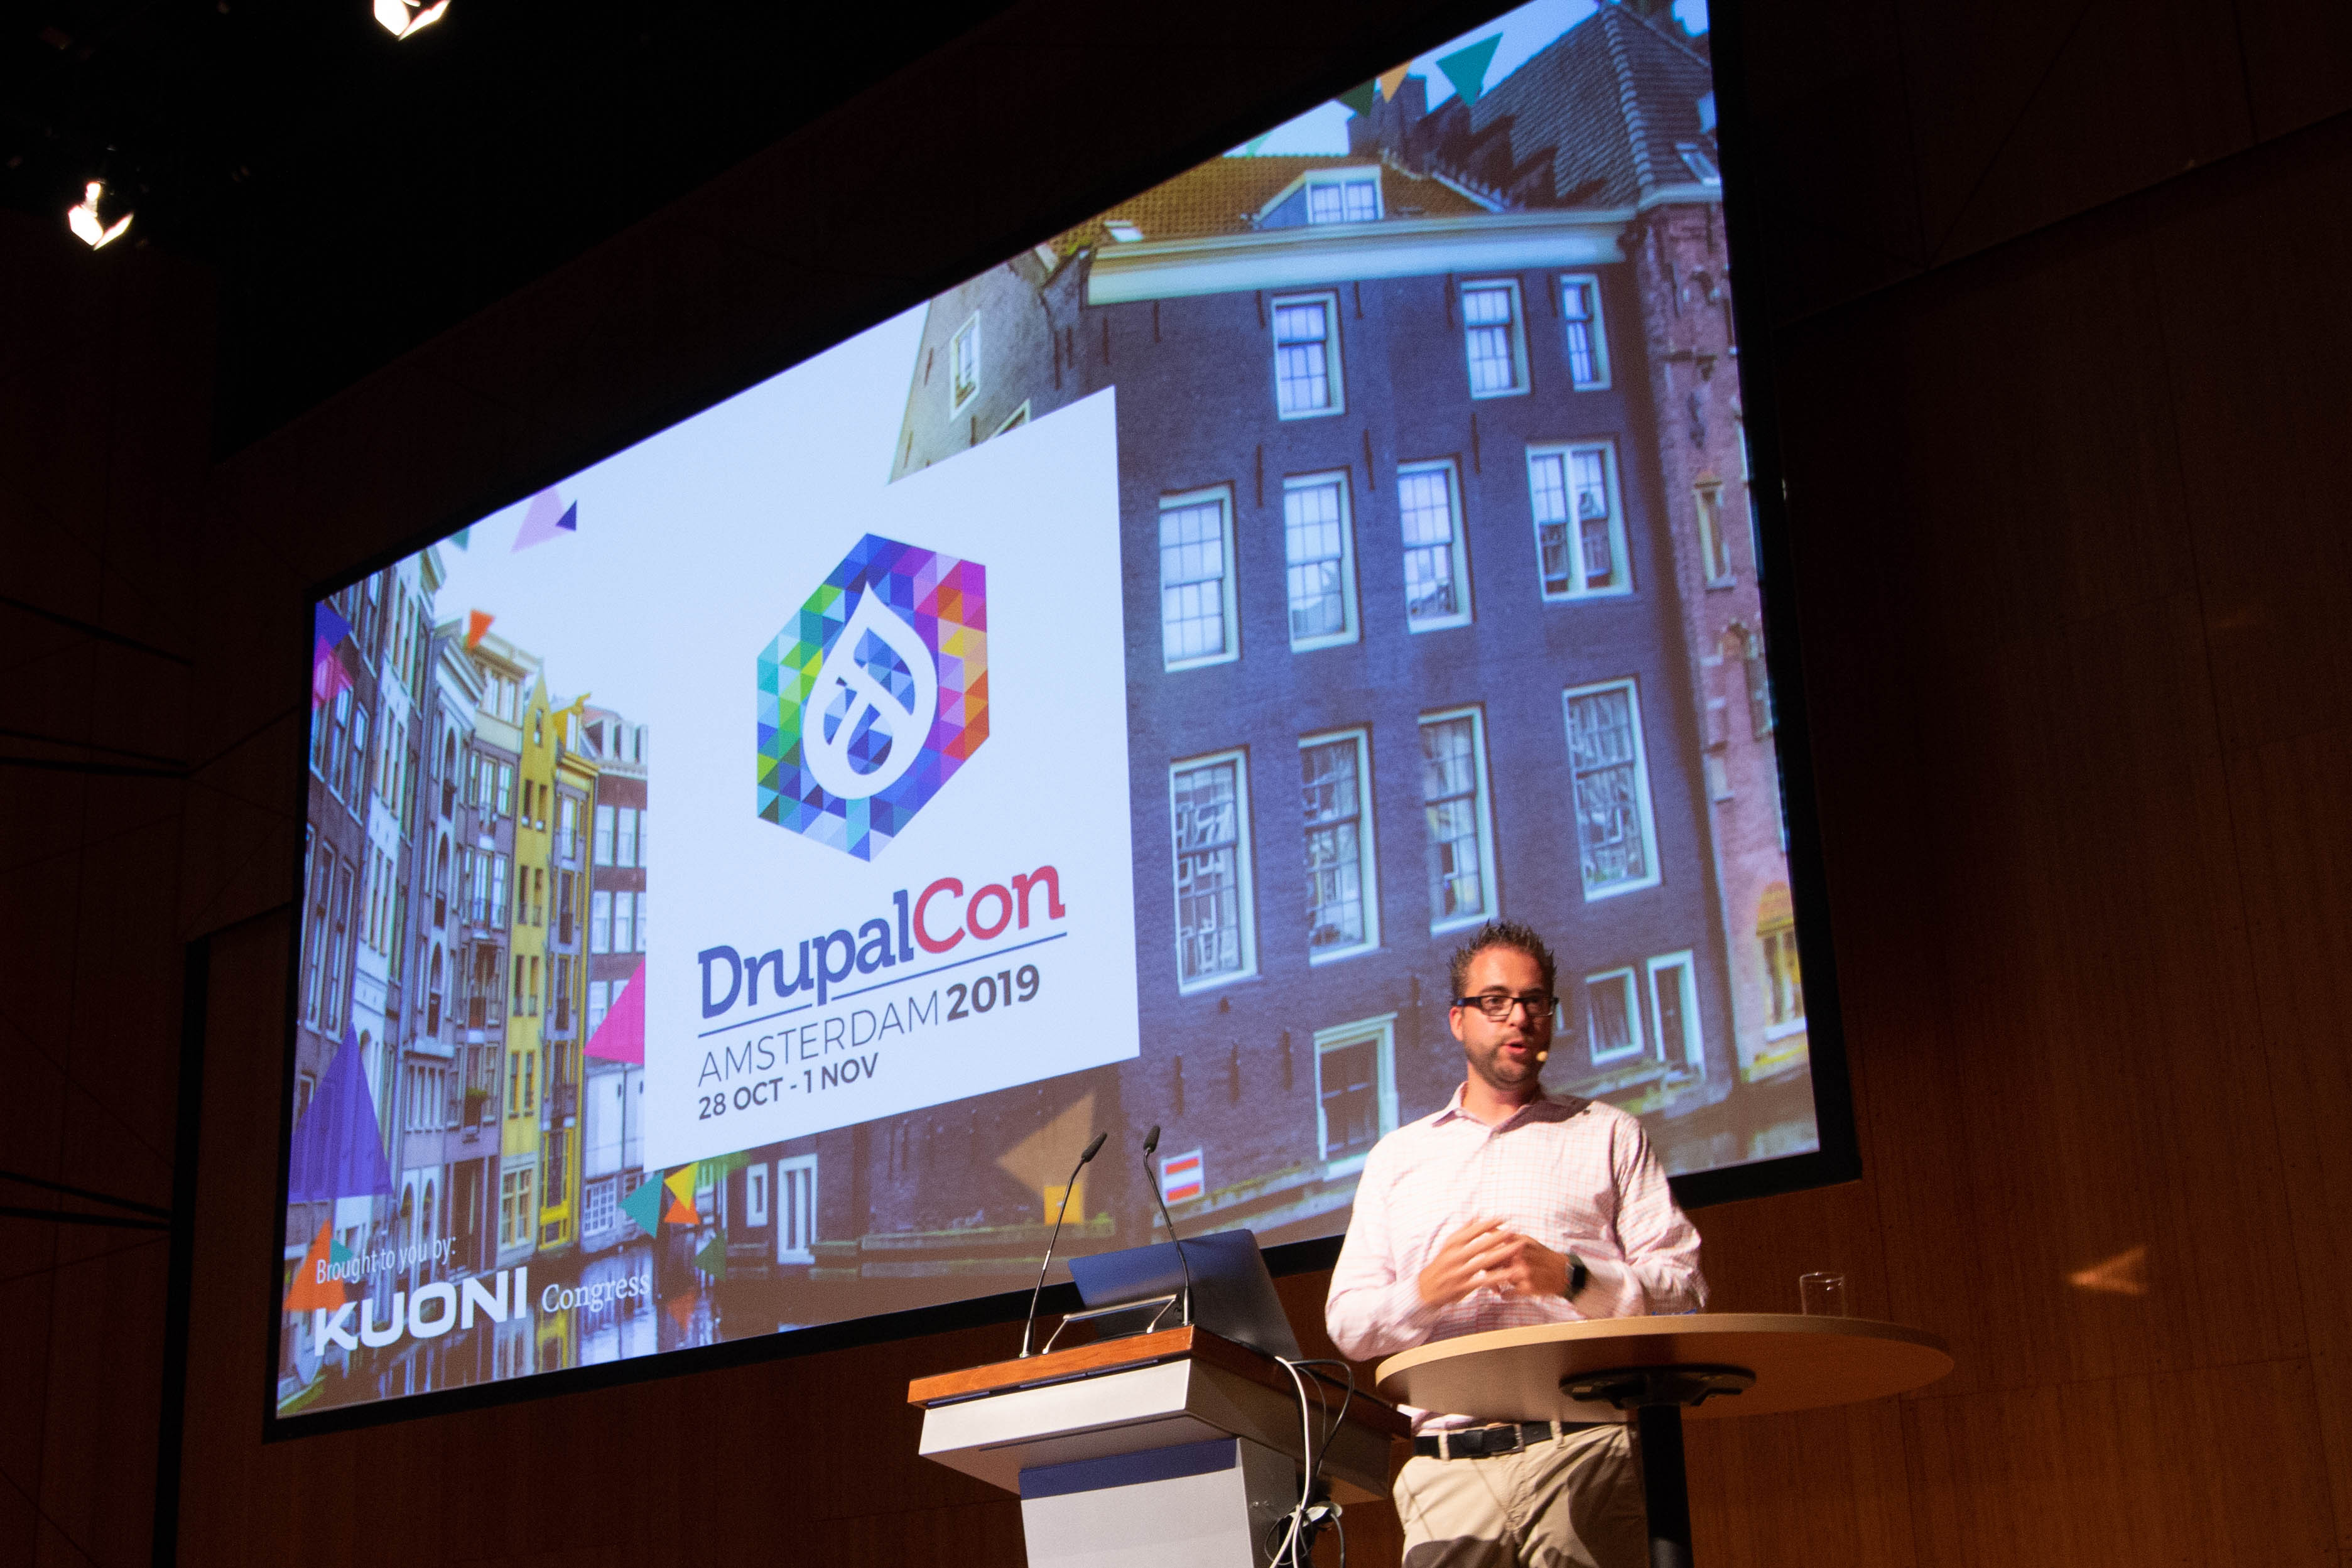 Driesnote Announces DrupalCon Amsterdam